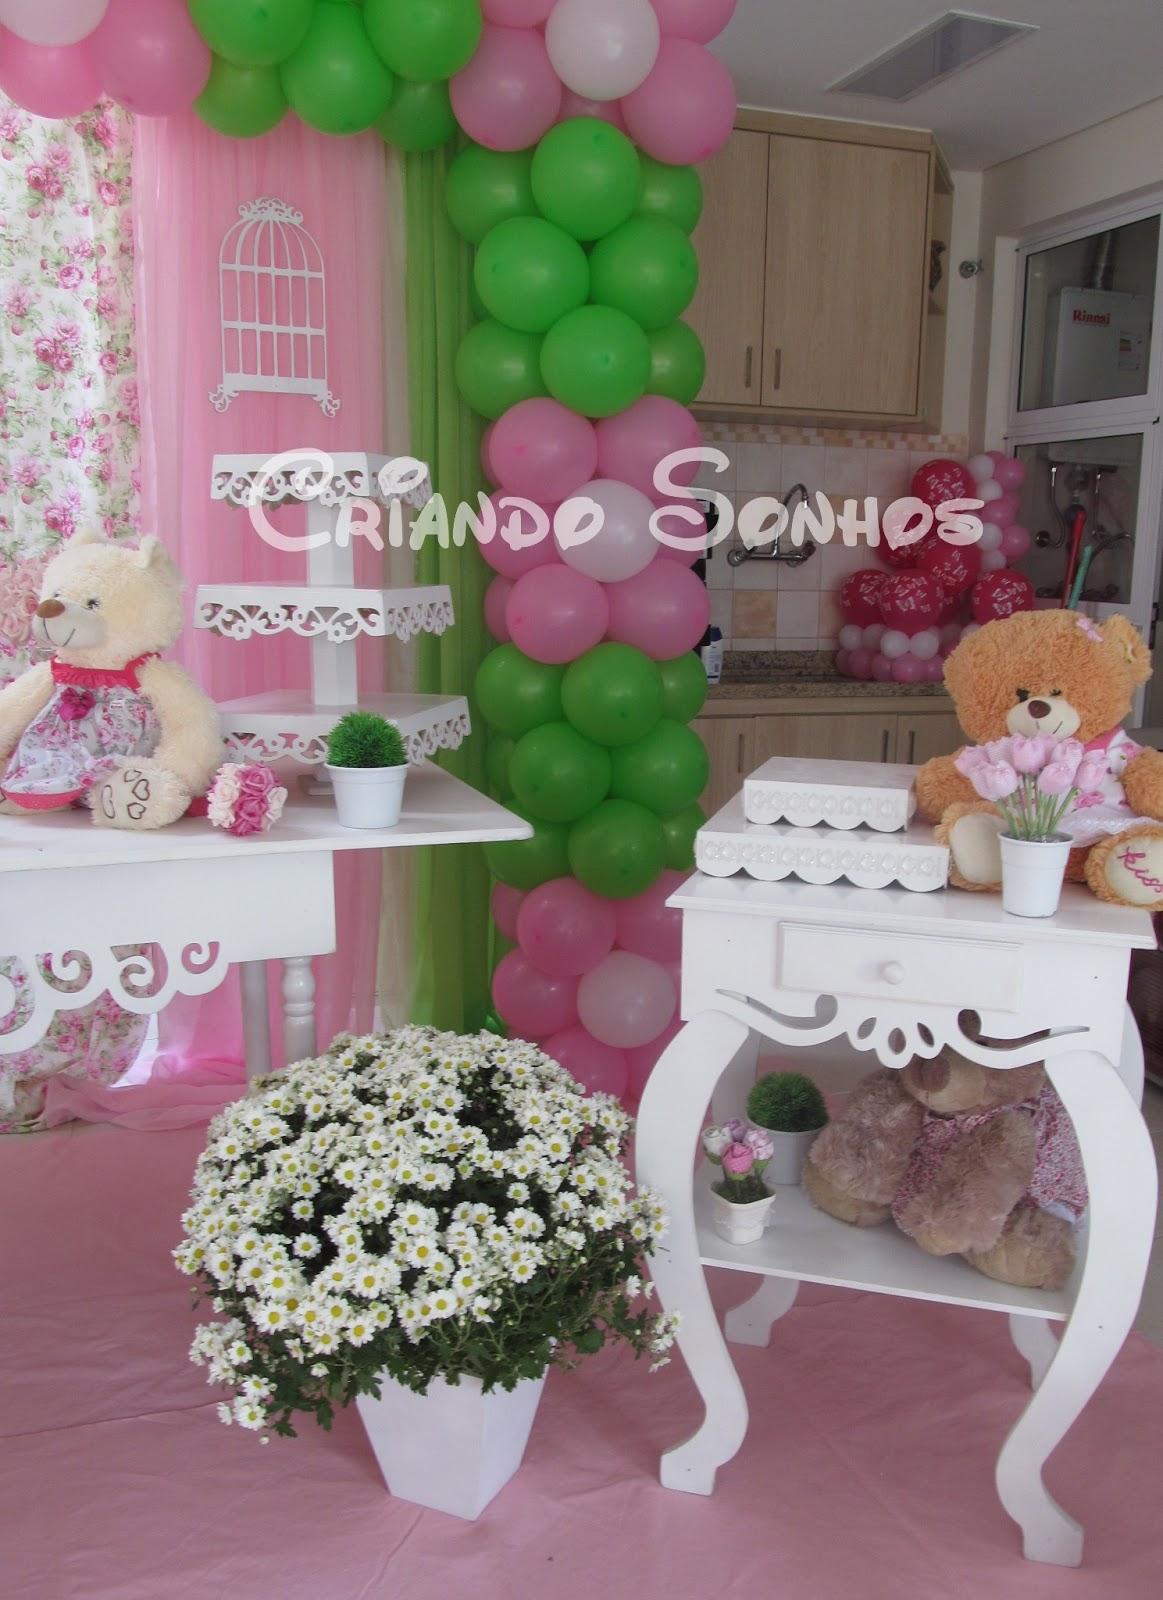 decoracao de festa infantil tema jardim:Tema Jardim das Ursas